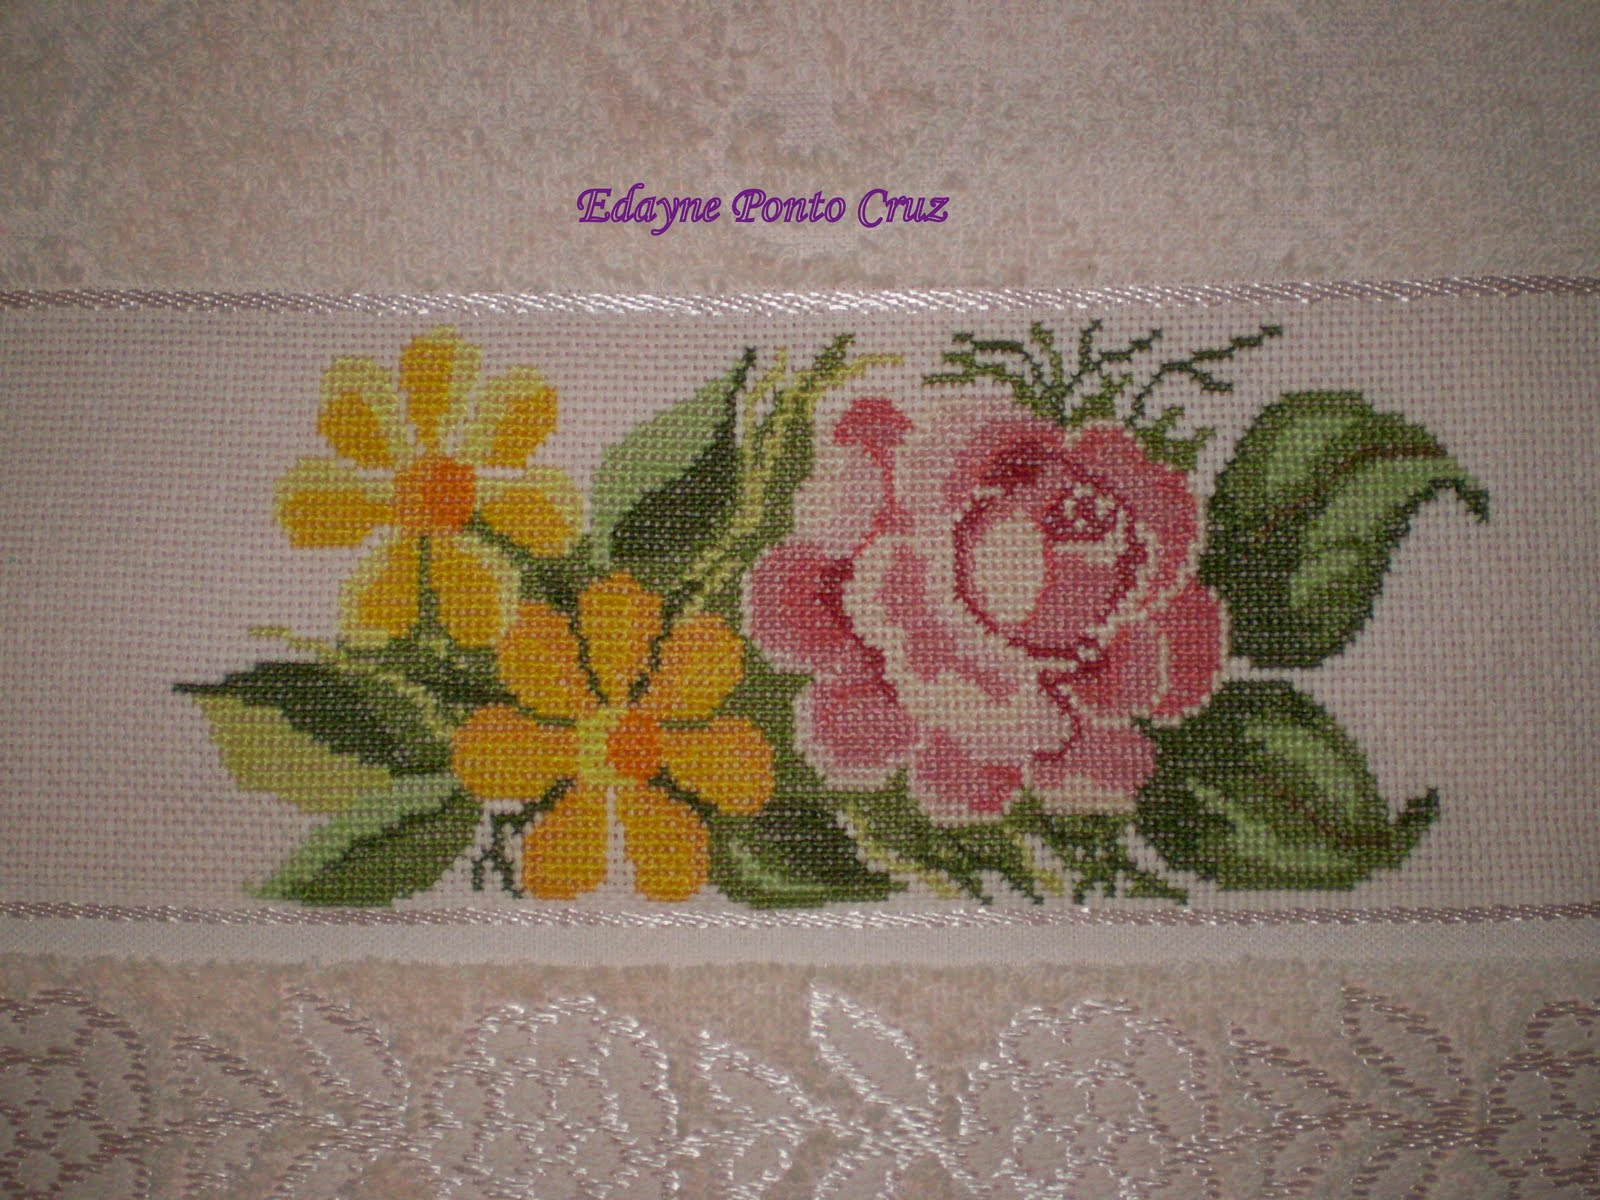 http://4.bp.blogspot.com/_SLKBtW8wcfA/THGEWRT3HkI/AAAAAAAABpA/7-H0GinSVfw/s1600/Detalhe+da+toalha+de+rosto+bordada+rosa.JPG